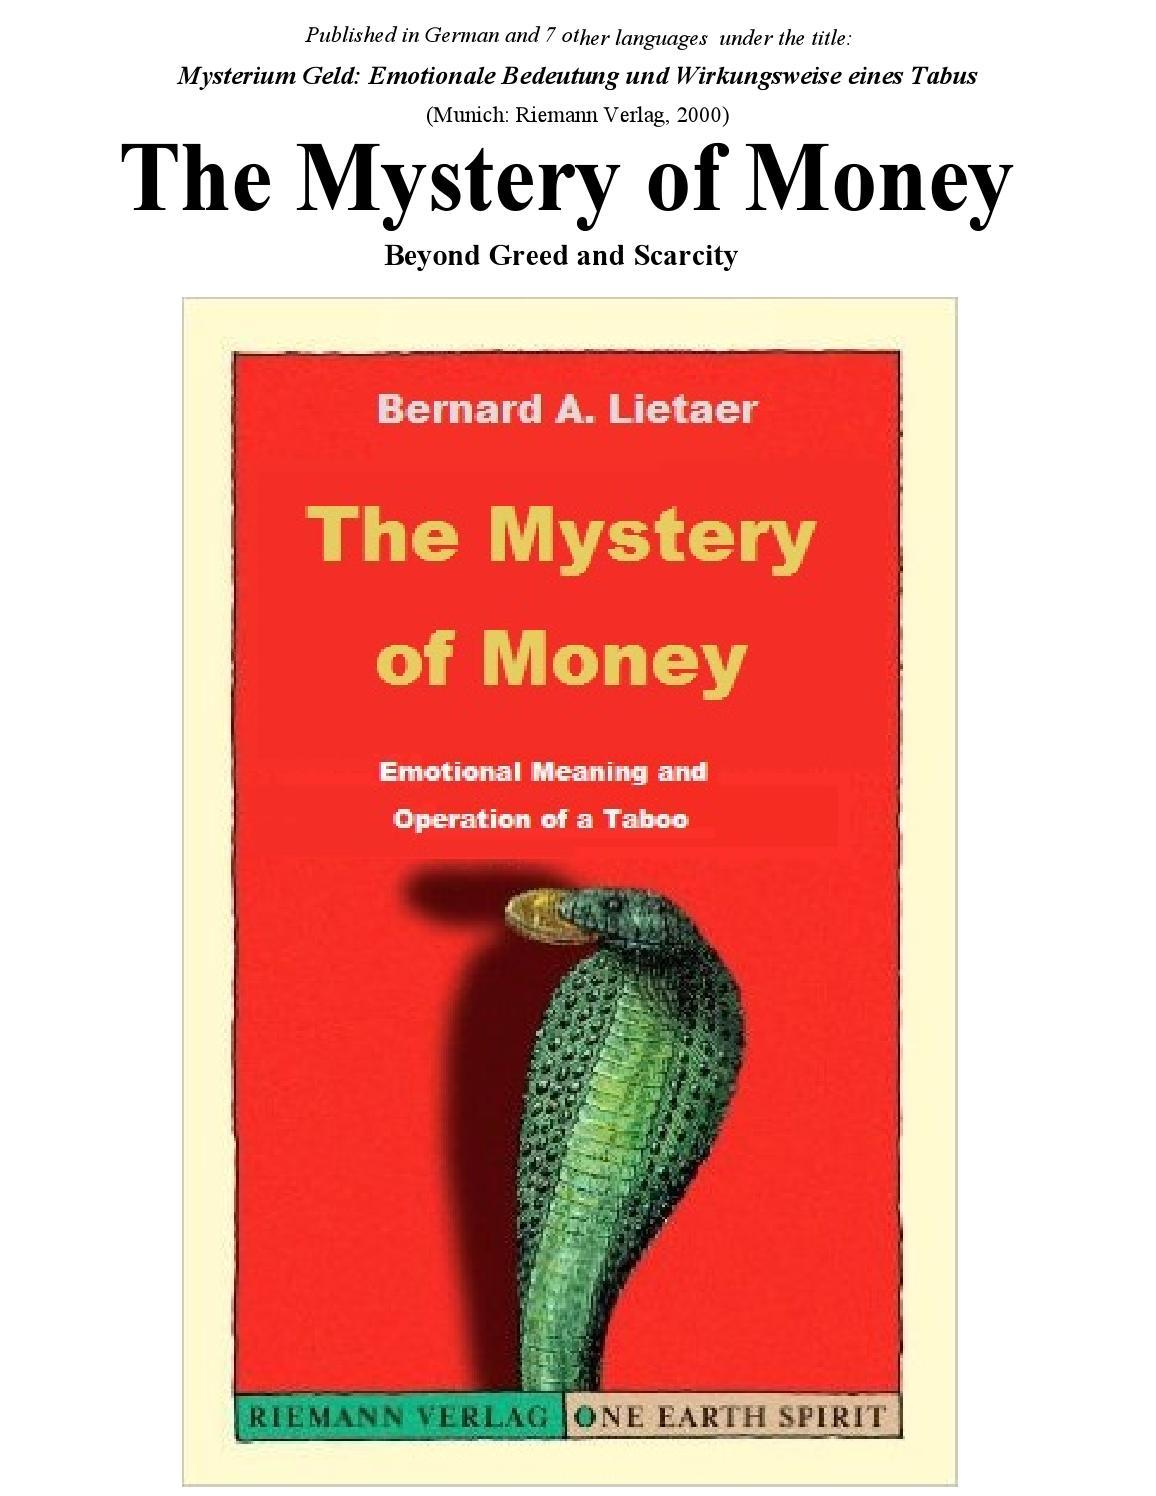 Bernard Lietaer - The Mystery of Money full book, 287pp by